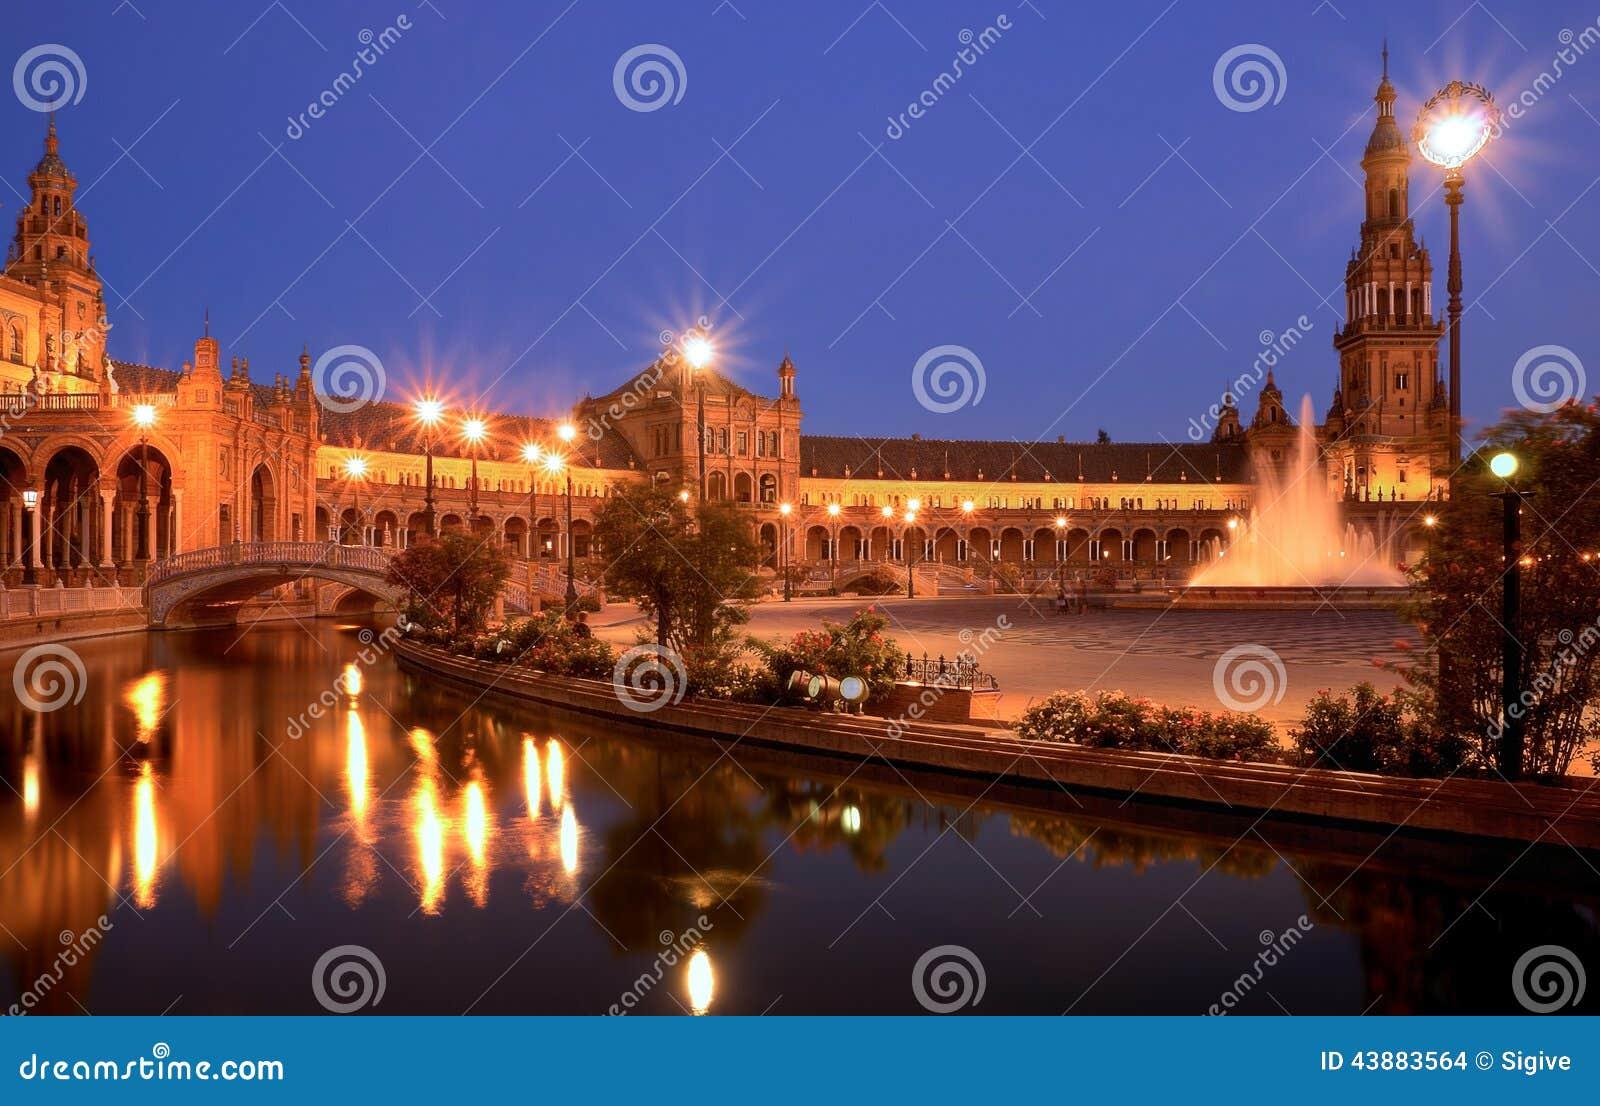 Plaza de espana Sevilla at night